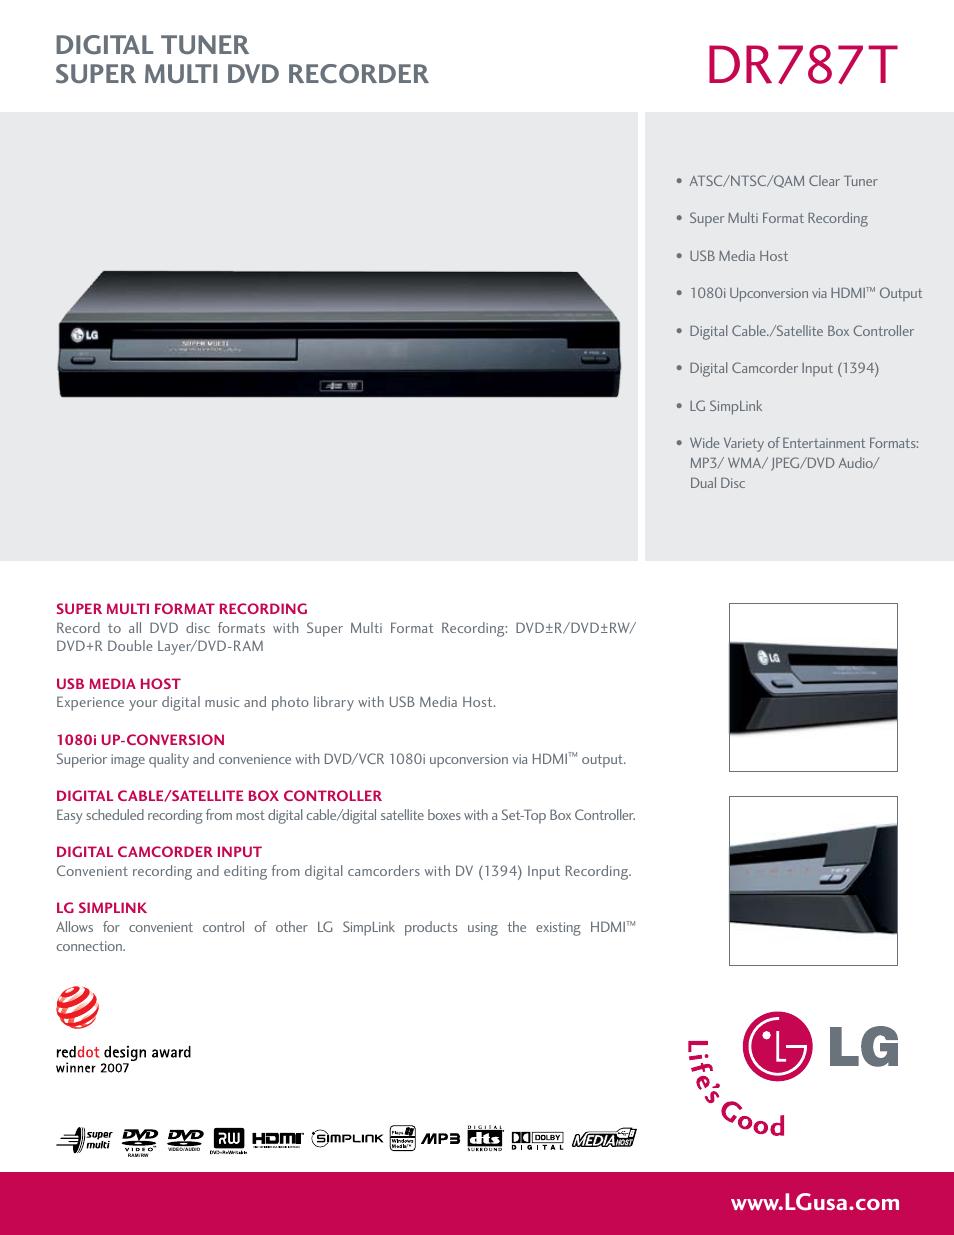 lg dr787t user manual 2 pages rh manualsdir com LG Cell Phone Operating Manual LG Instruction Manual